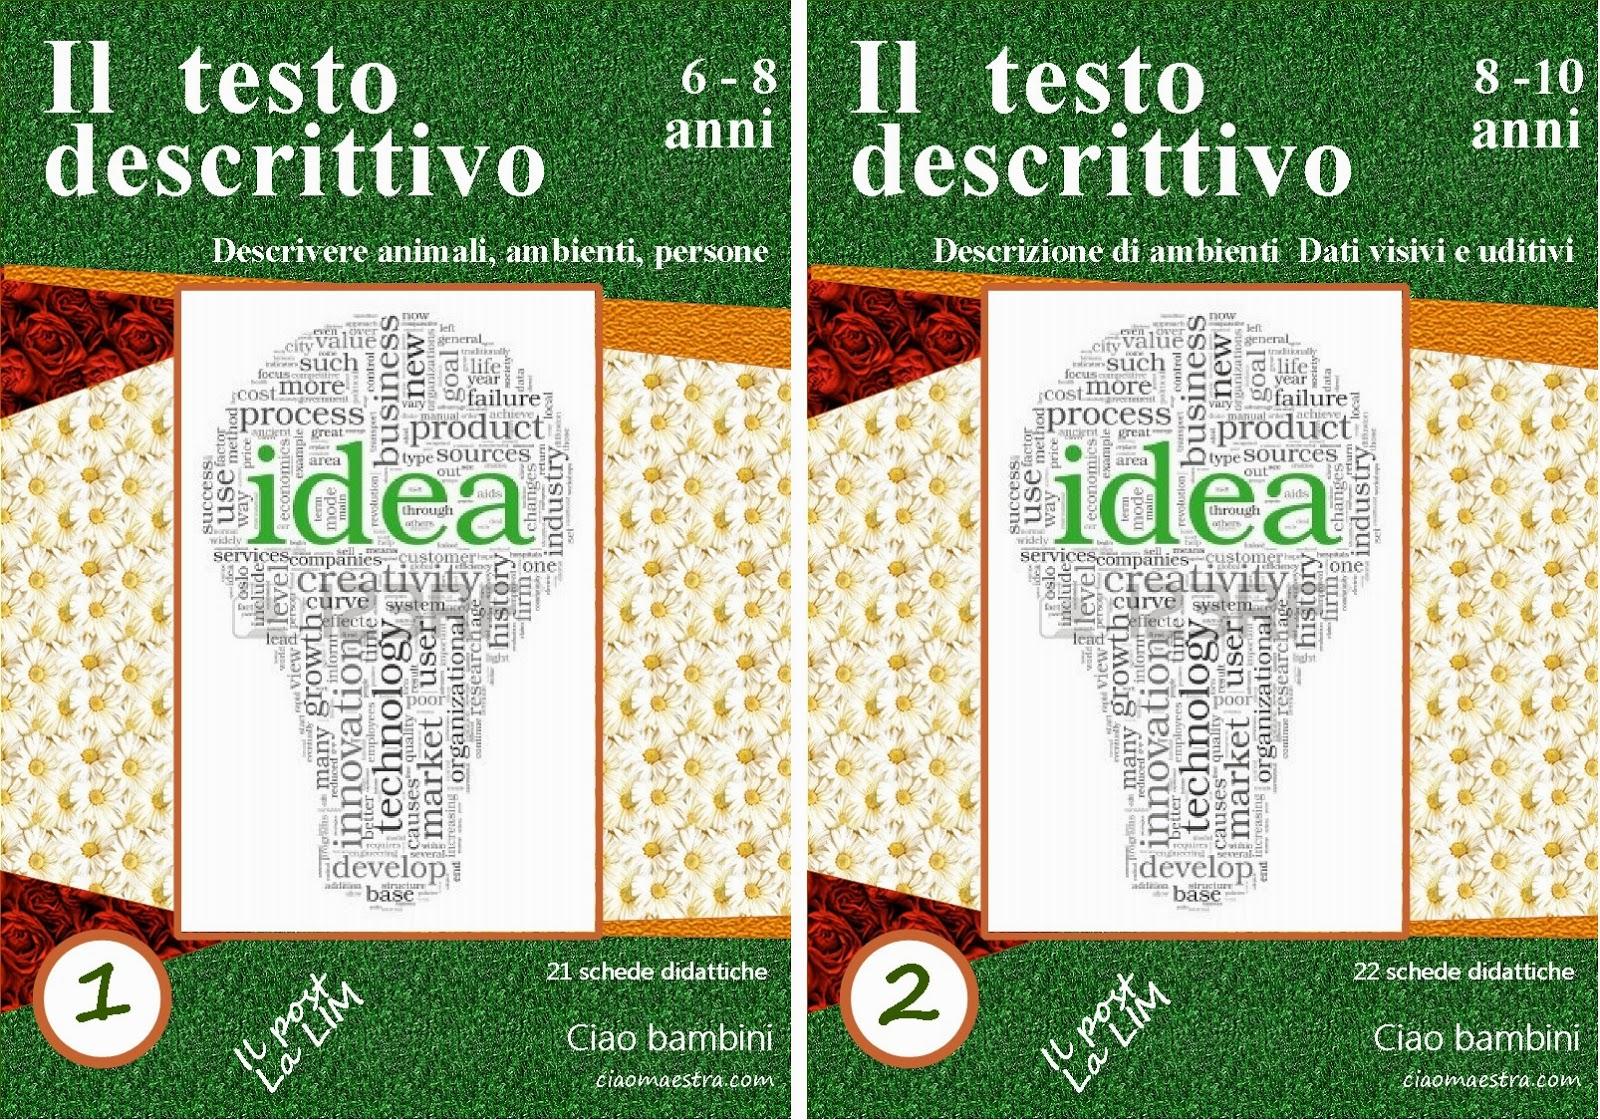 Ciao bambini gli ebook i due ebook il testo descrittivo 1 2 insieme a 489 zip 54m fandeluxe Ebook collections